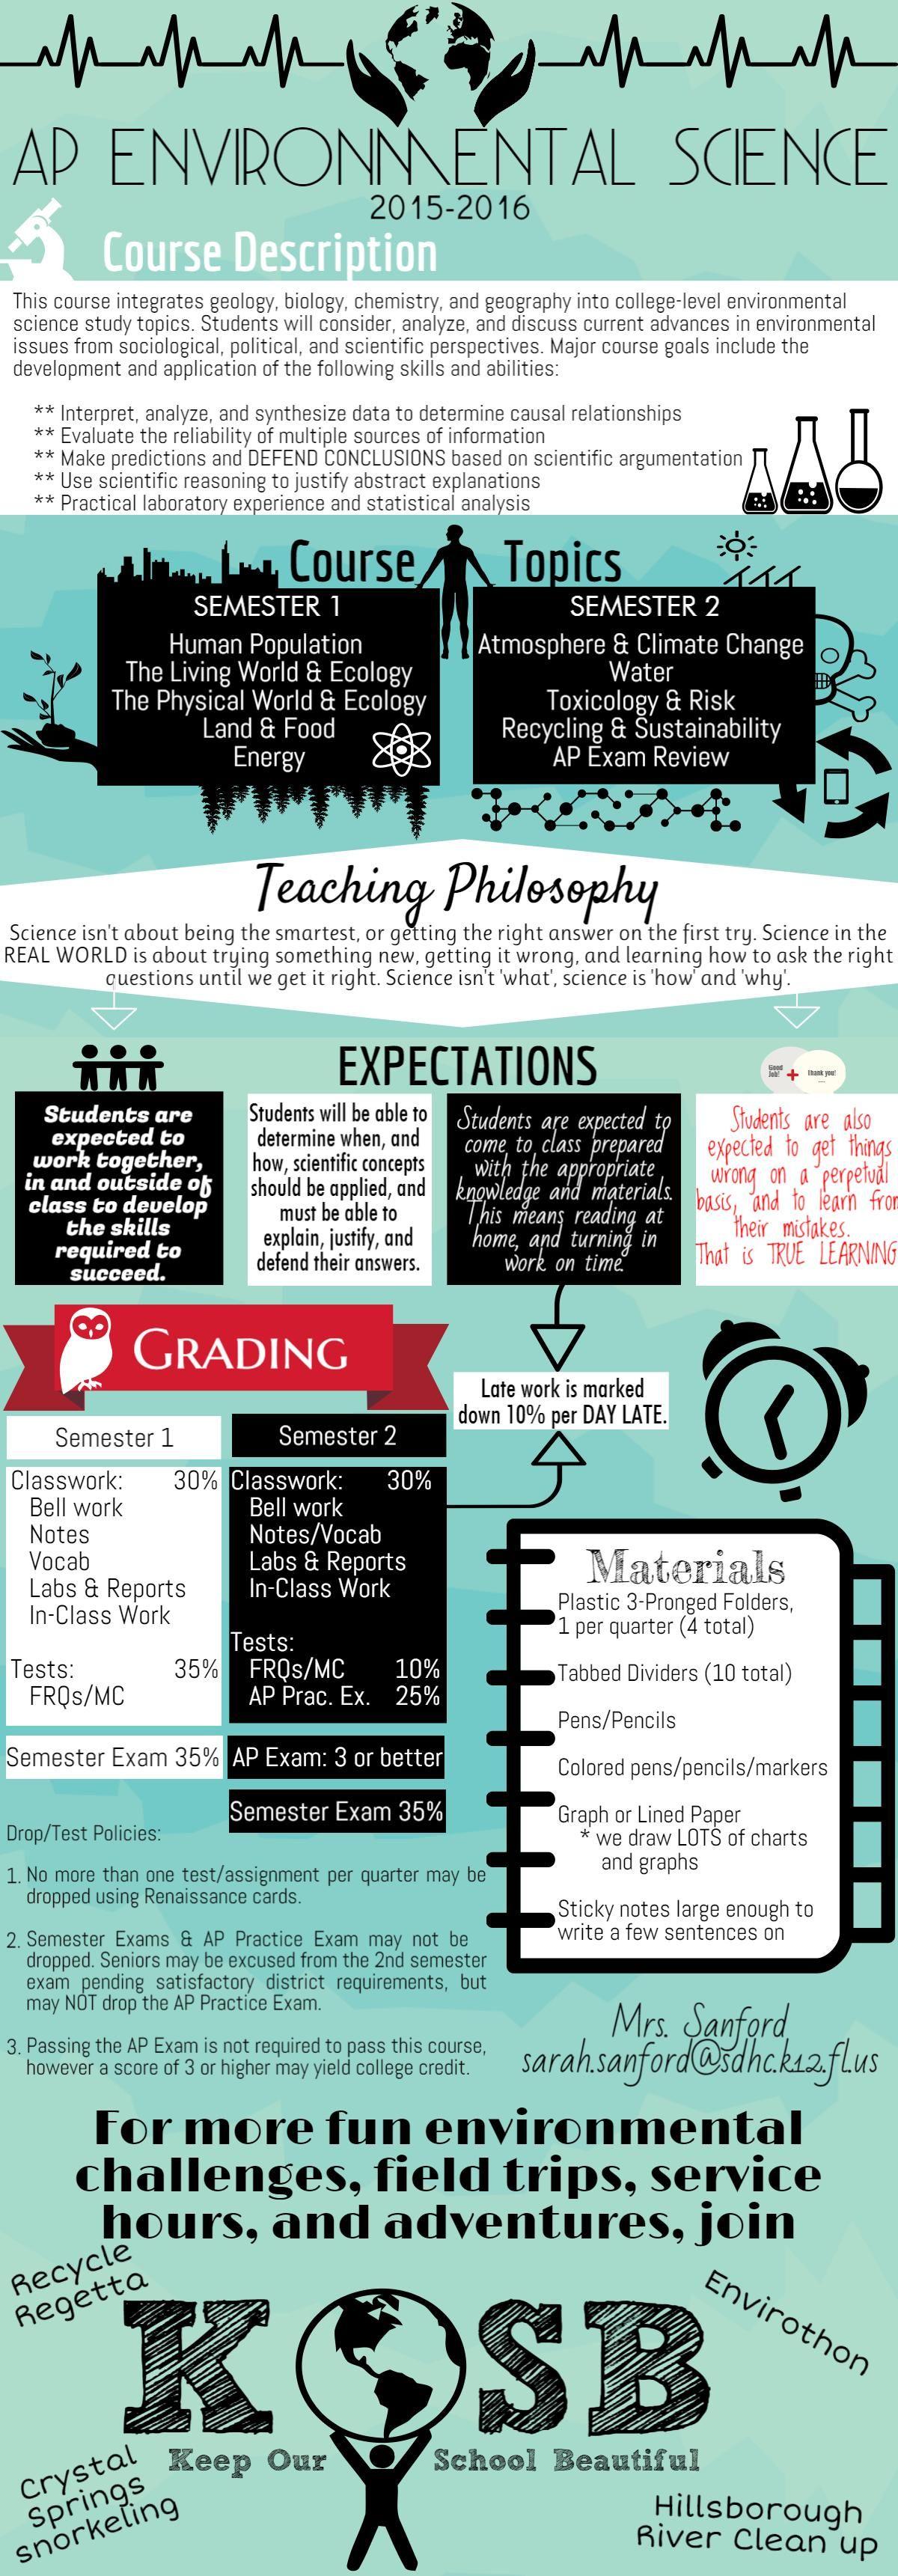 Create Infographic Presentation Report Piktochart Ap Environmental Science Major Marine Biology Dissertation Ideas